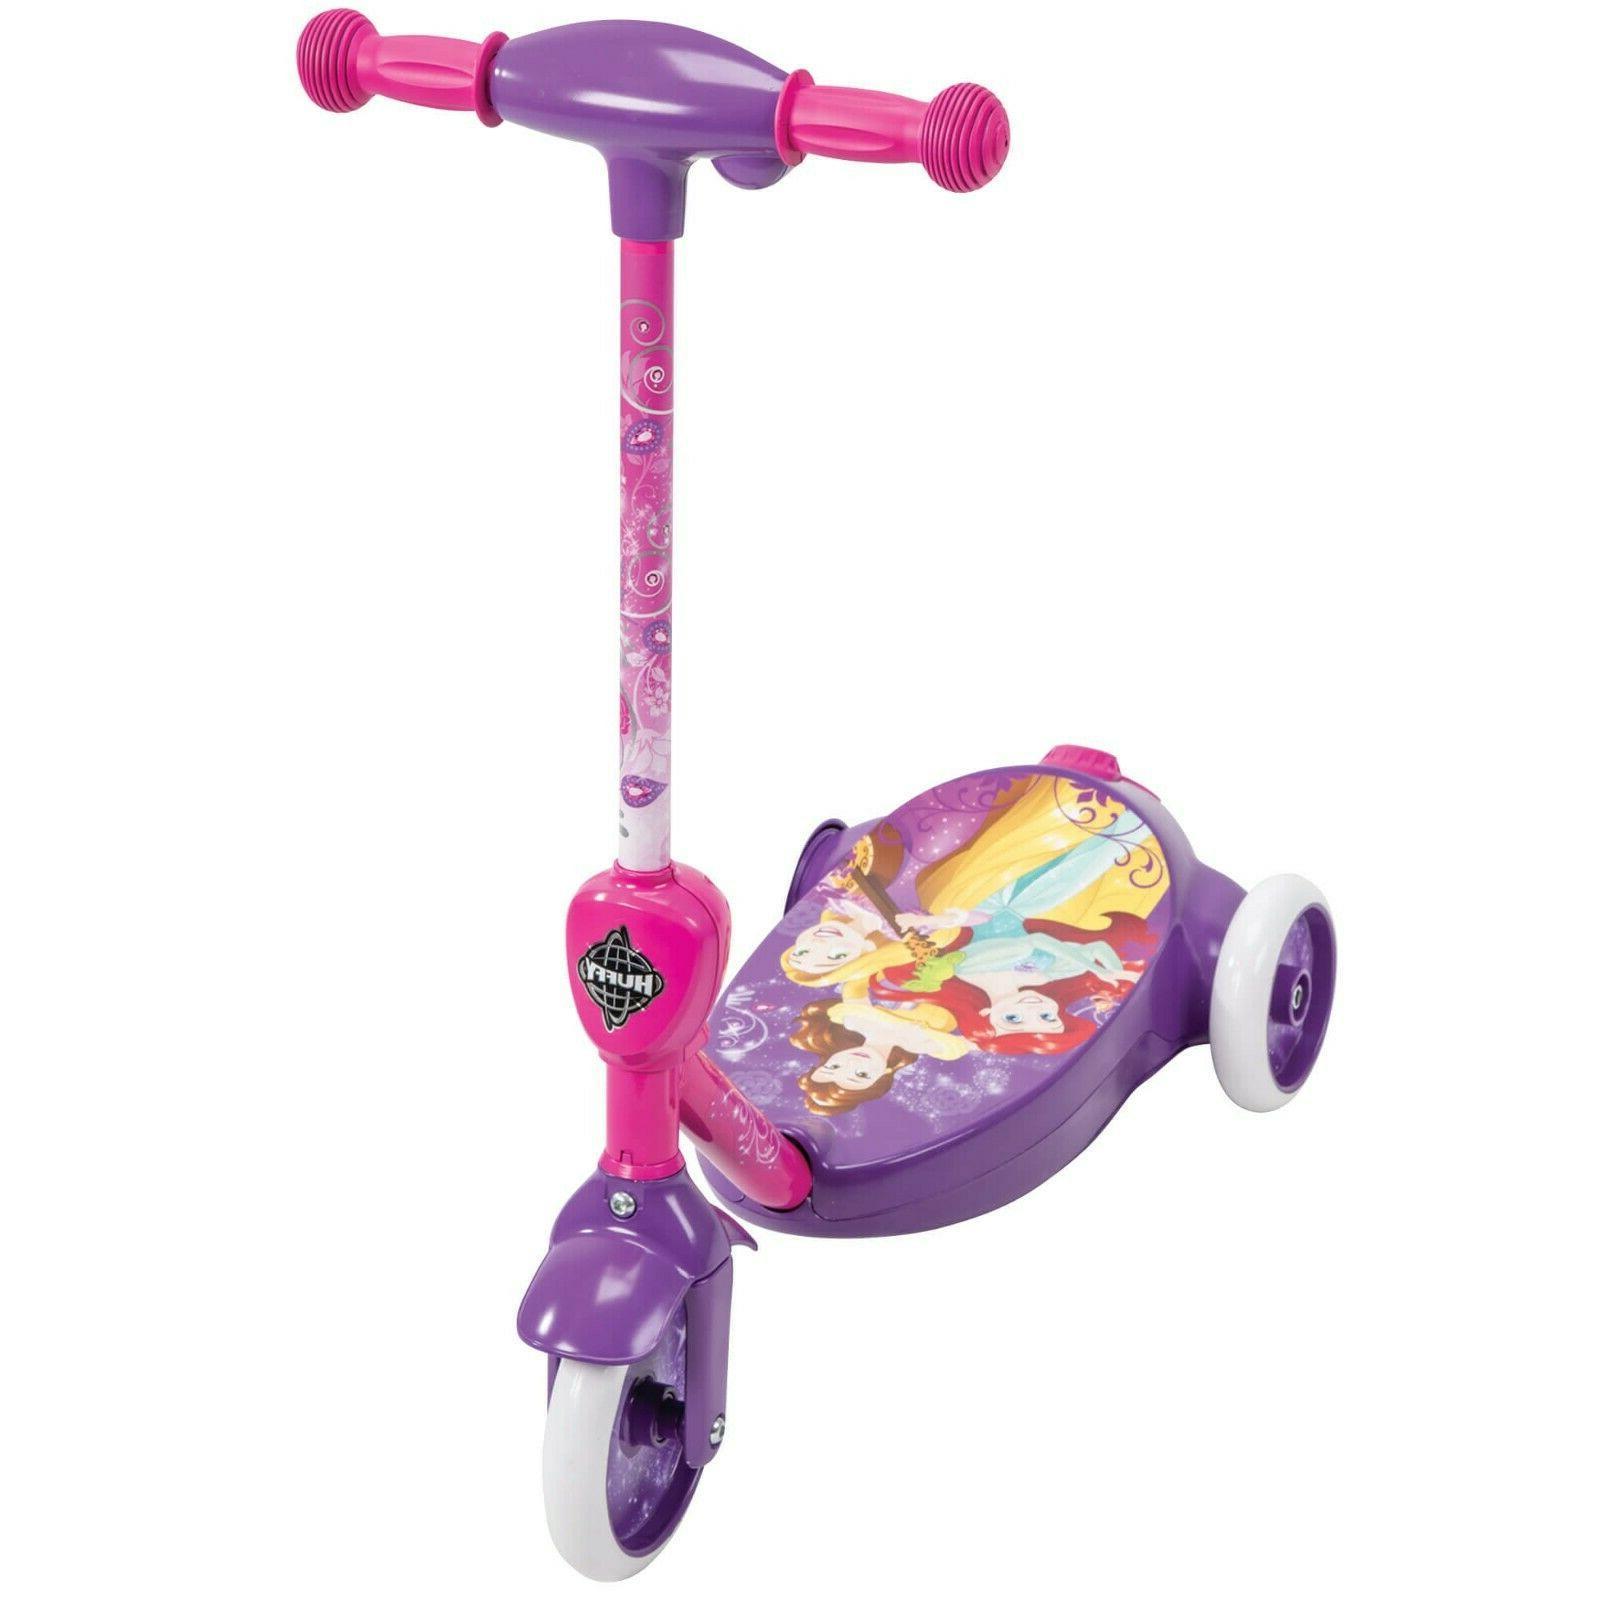 3-Wheel Scooter Deck Fun Pink